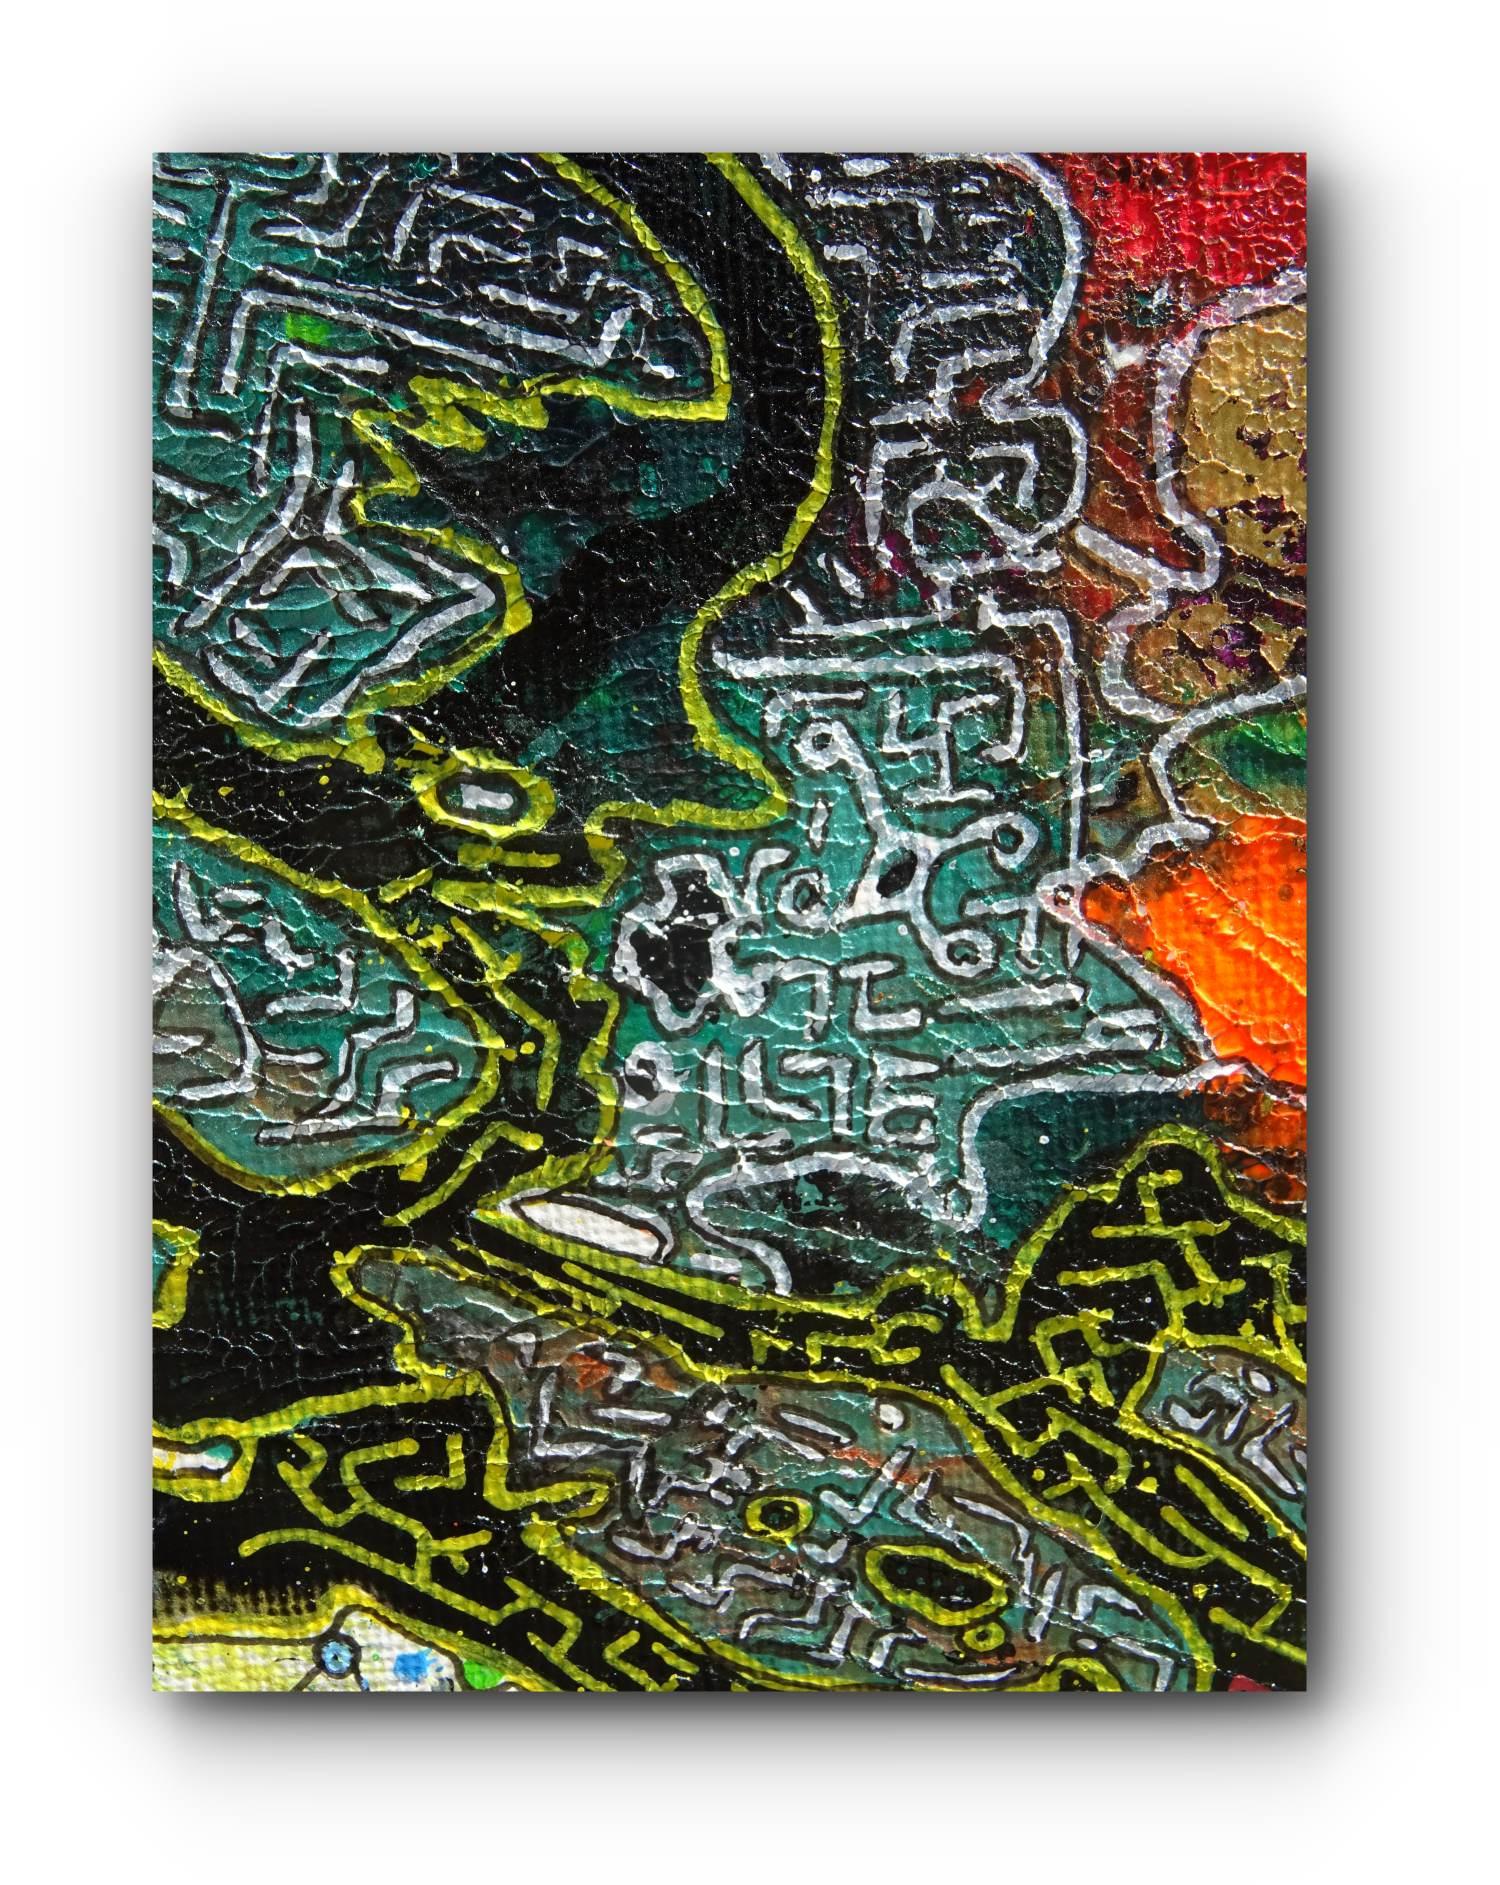 painting-detail-9-ground-control-artists-ingress-vortices.jpg